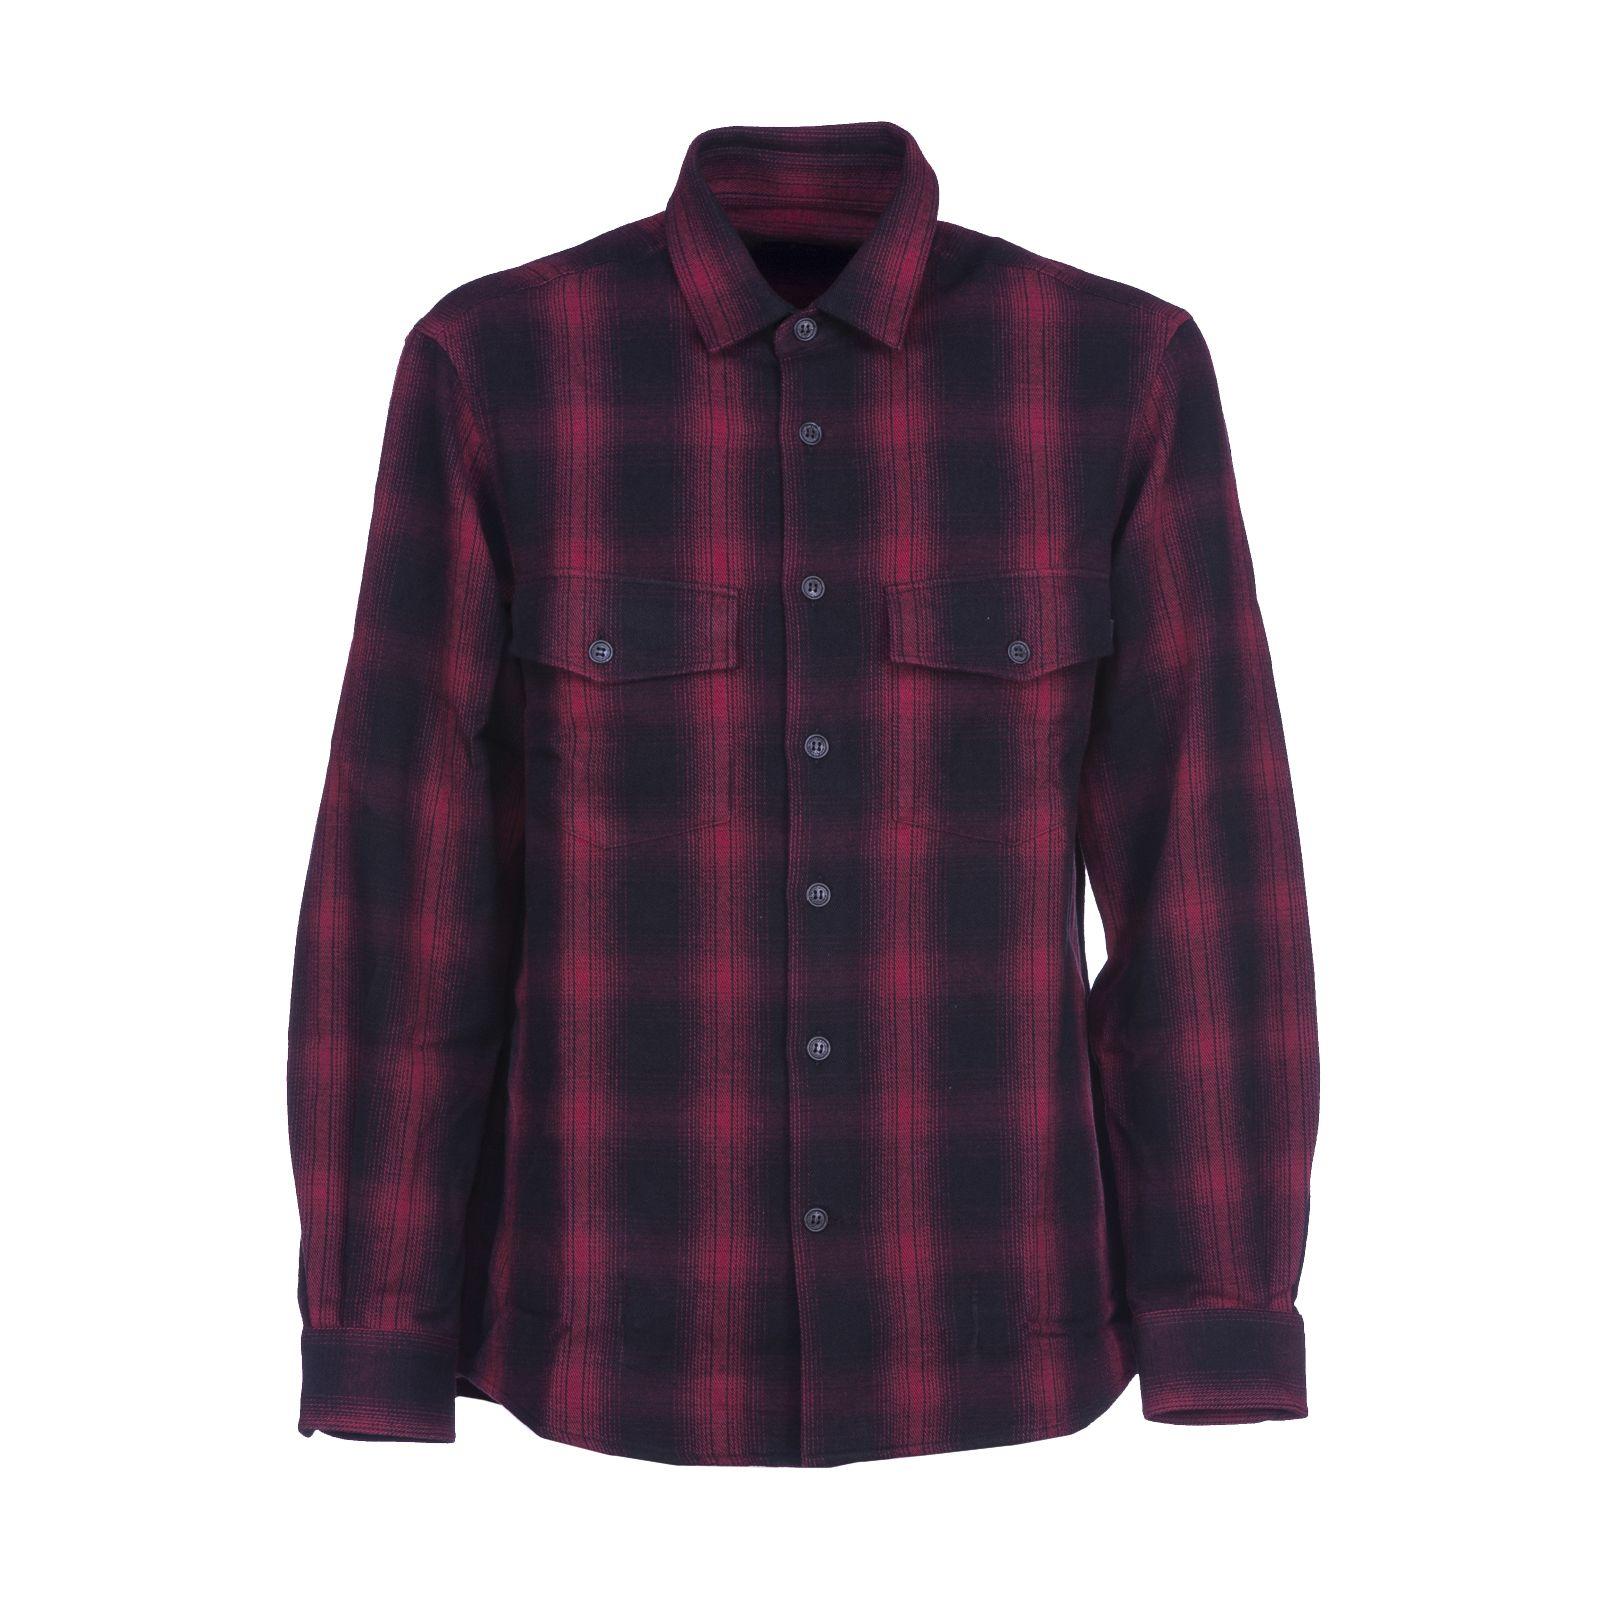 Marcelo Burlon County Of Milan Iamens Shirt